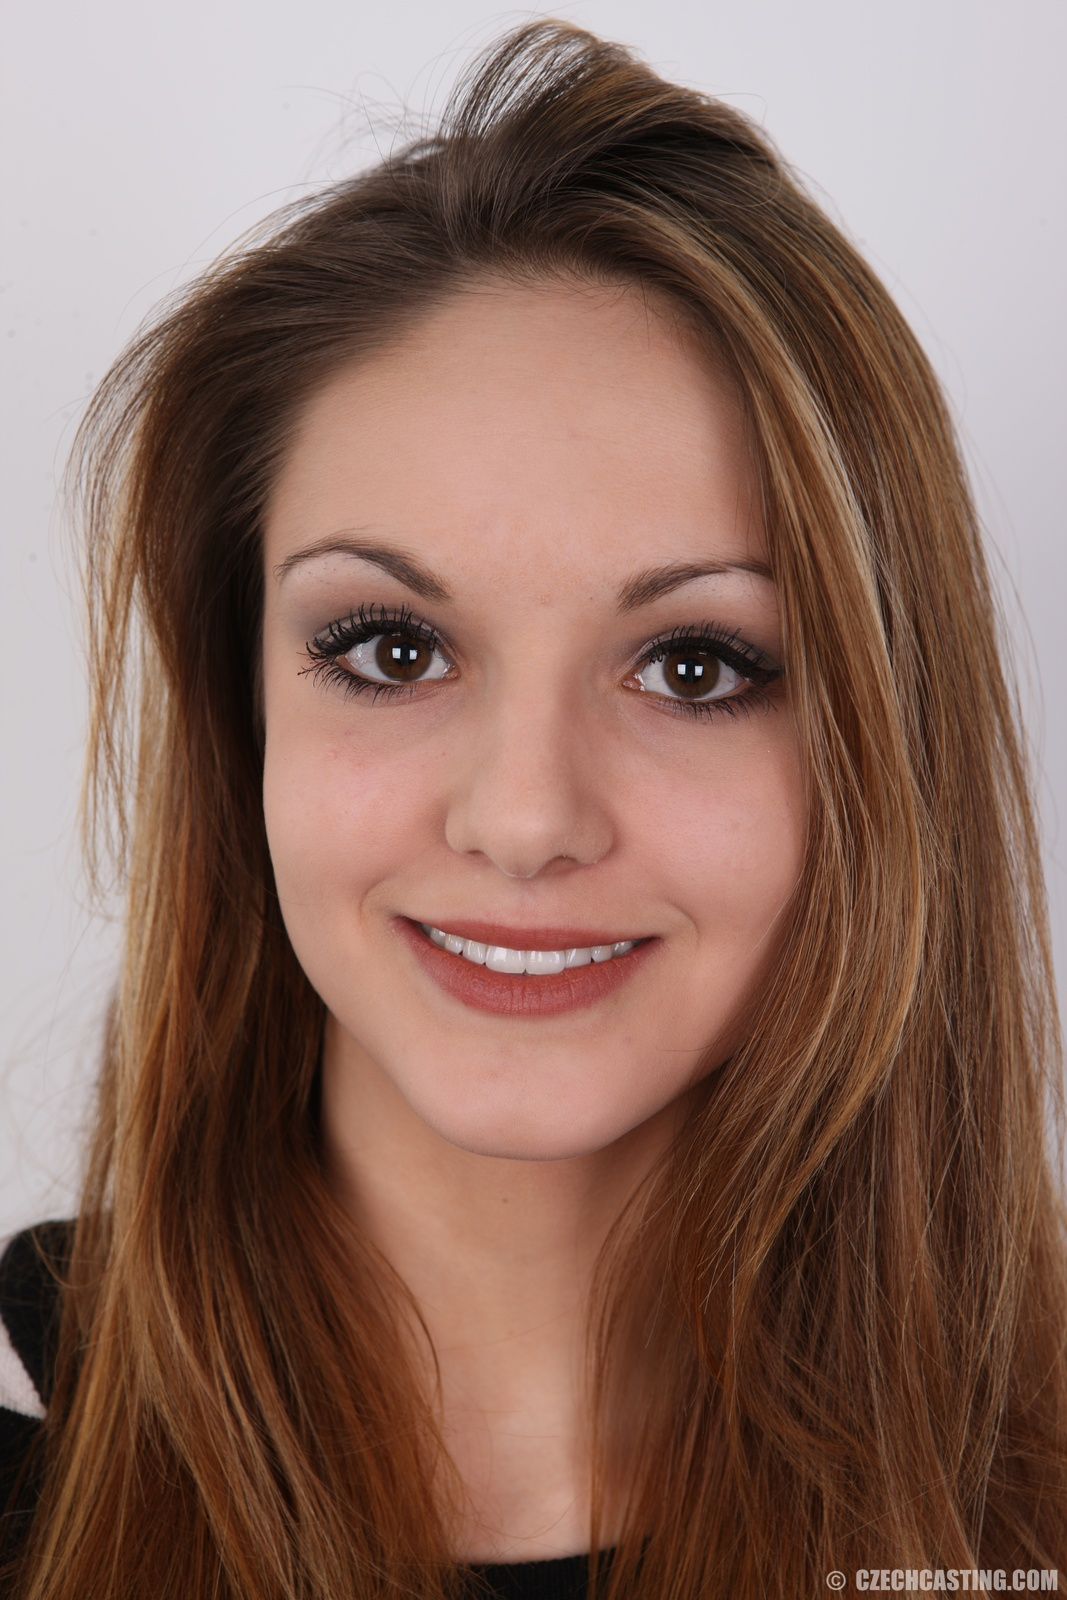 Lucie - Czech Casting